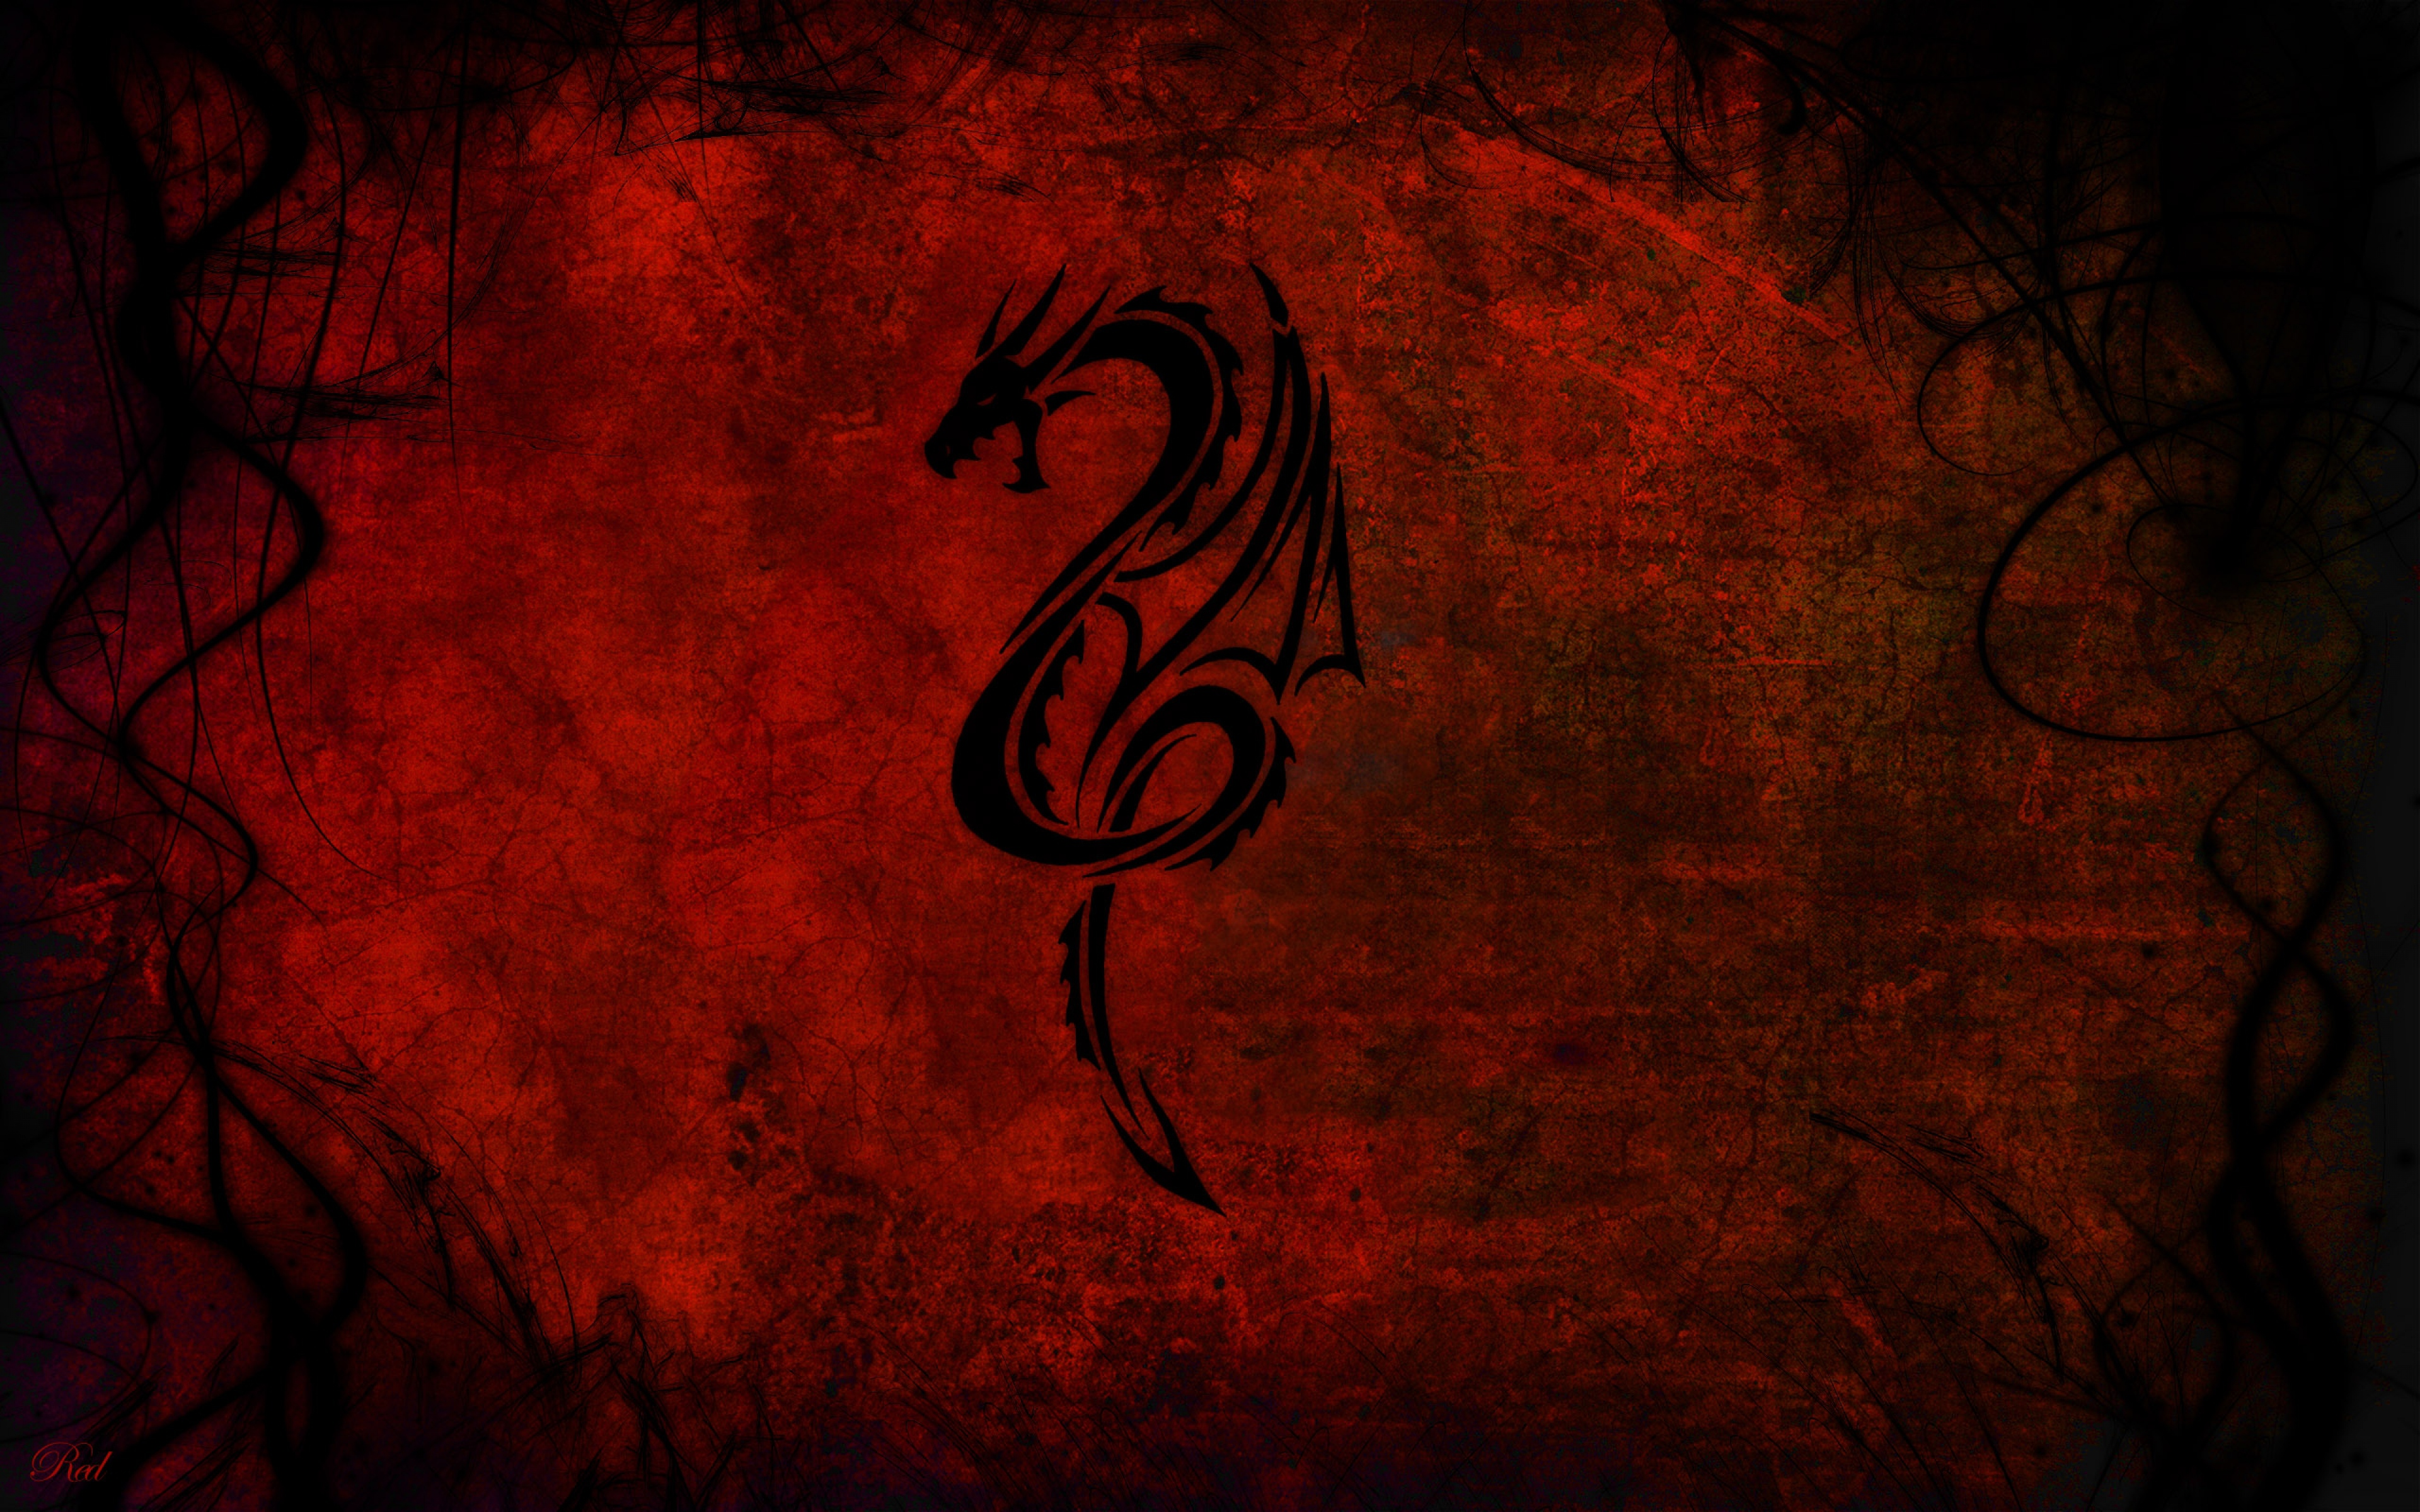 Download Wallpaper 3840x2400 Dragon Pattern Red Black Ultra HD 4K 3840x2400